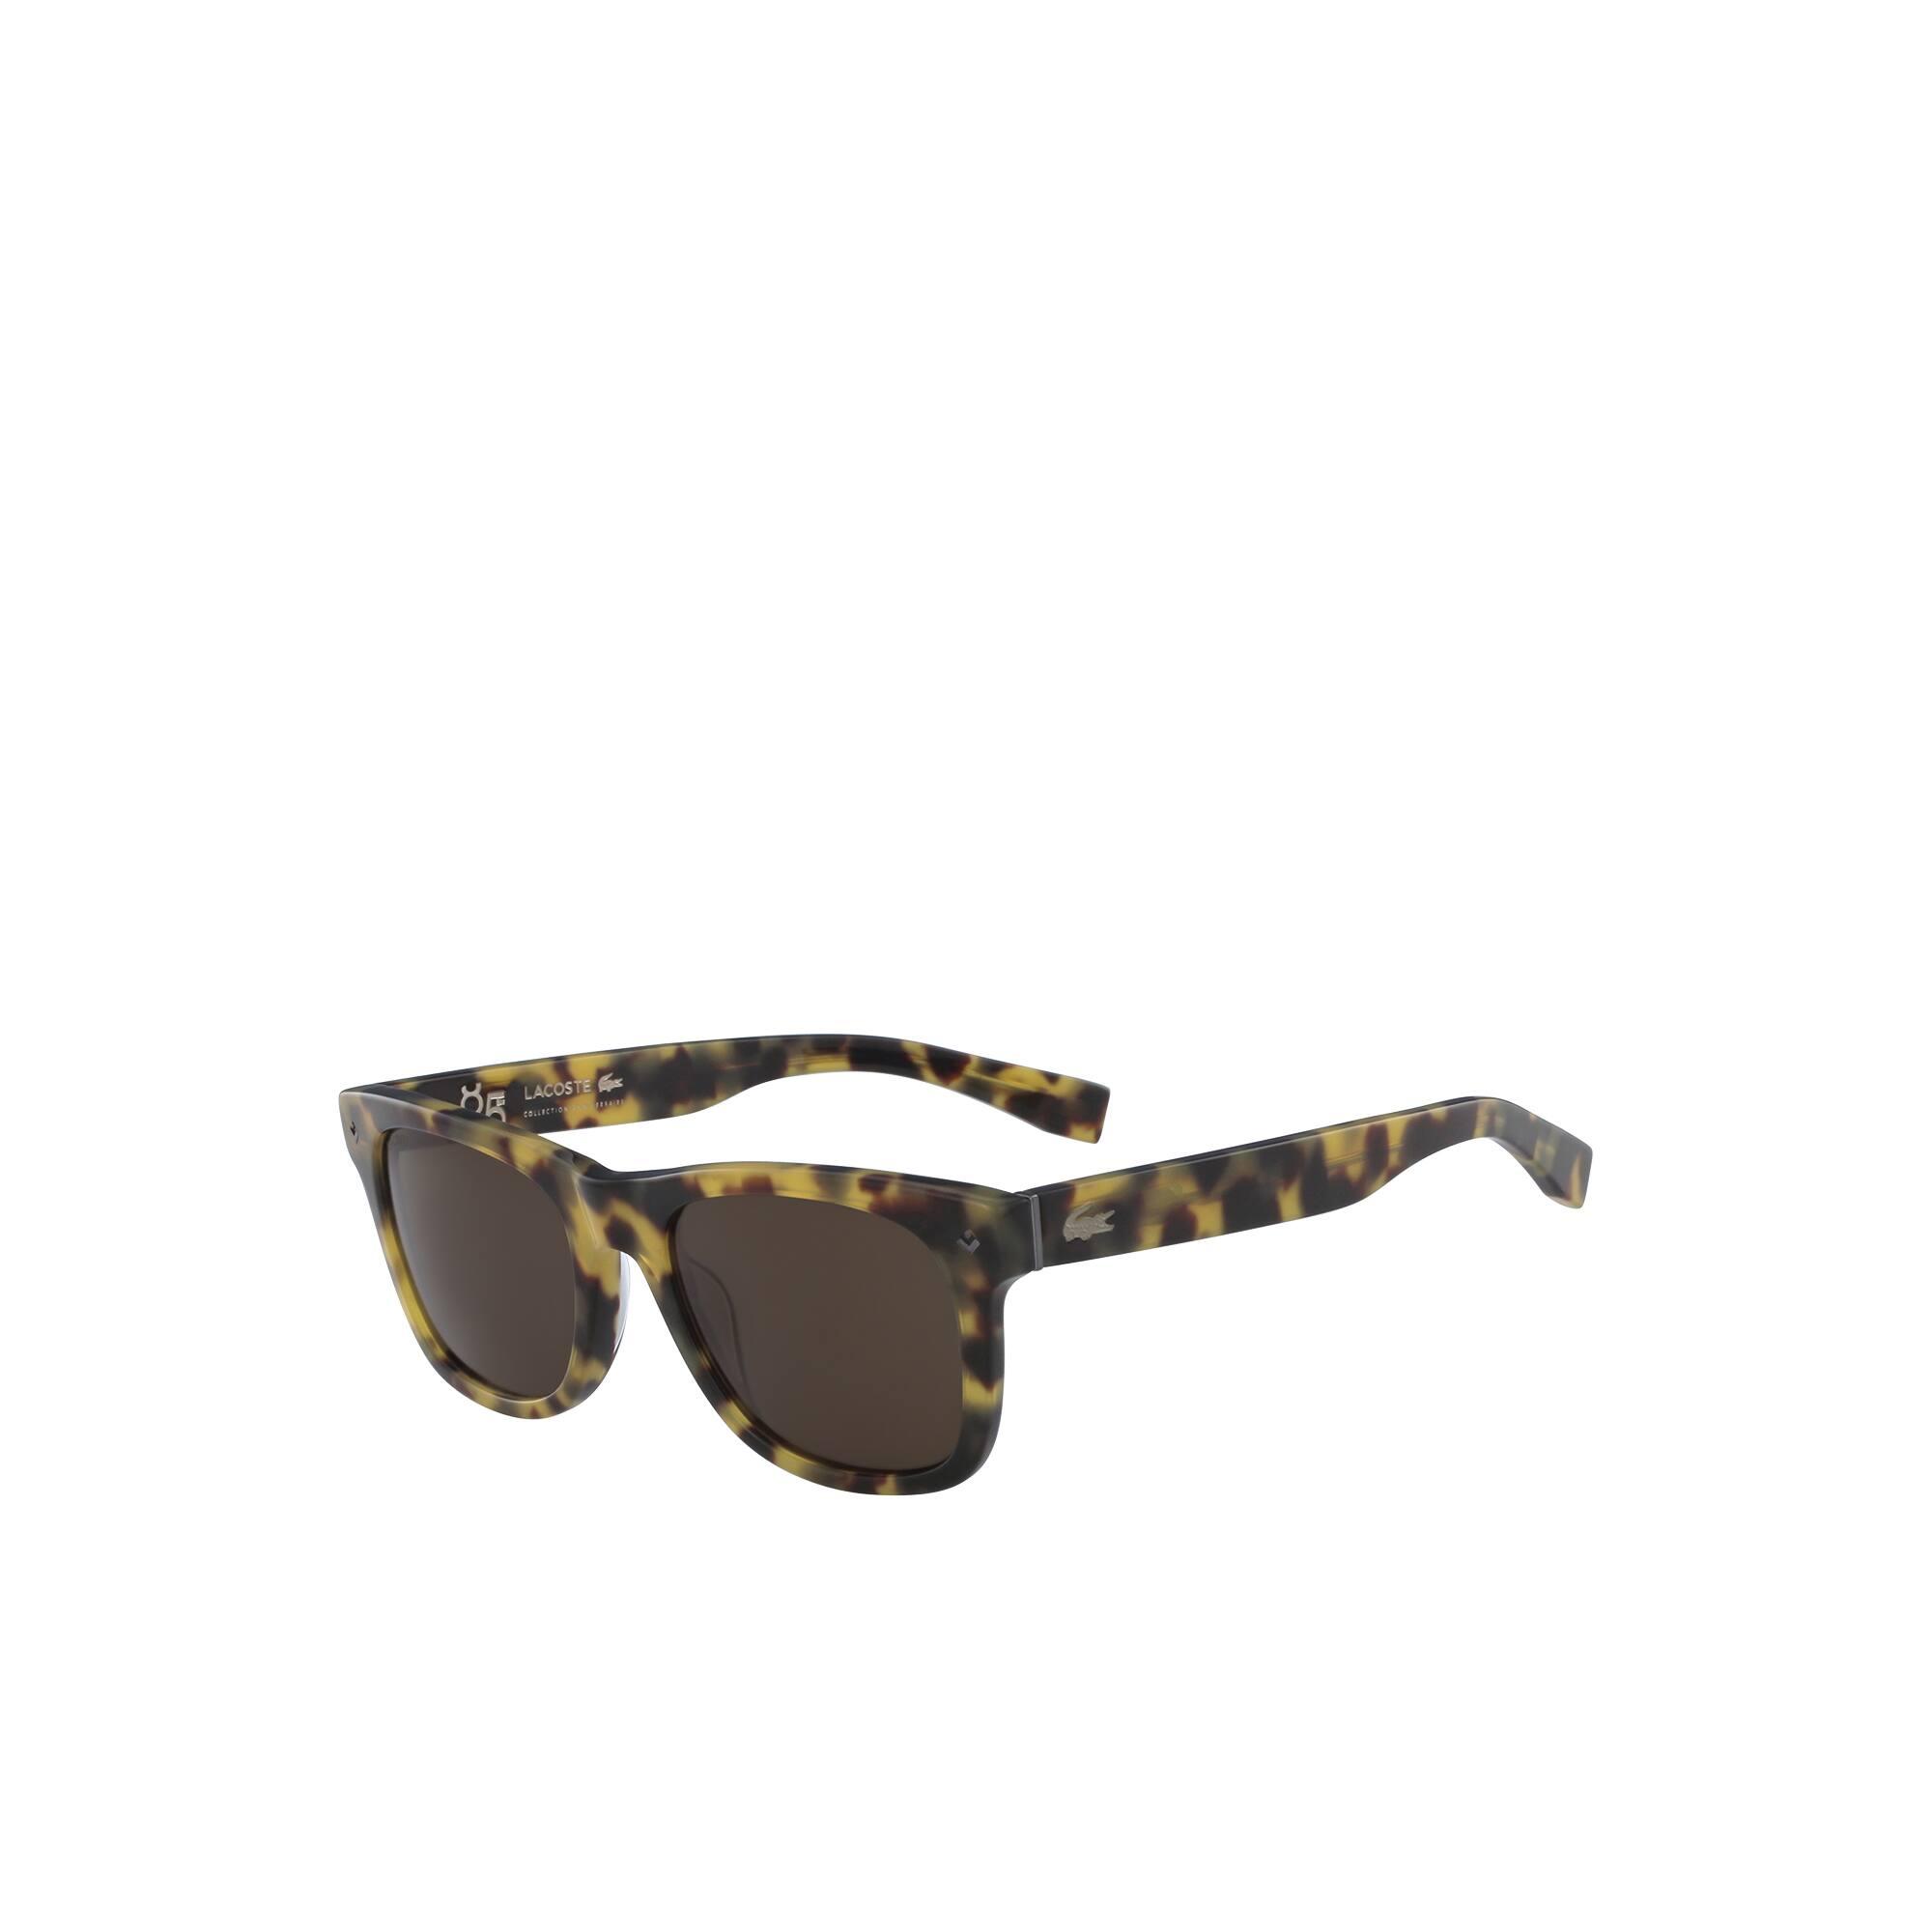 Petit piqué-zonnebril unisex met acetaatmontuur